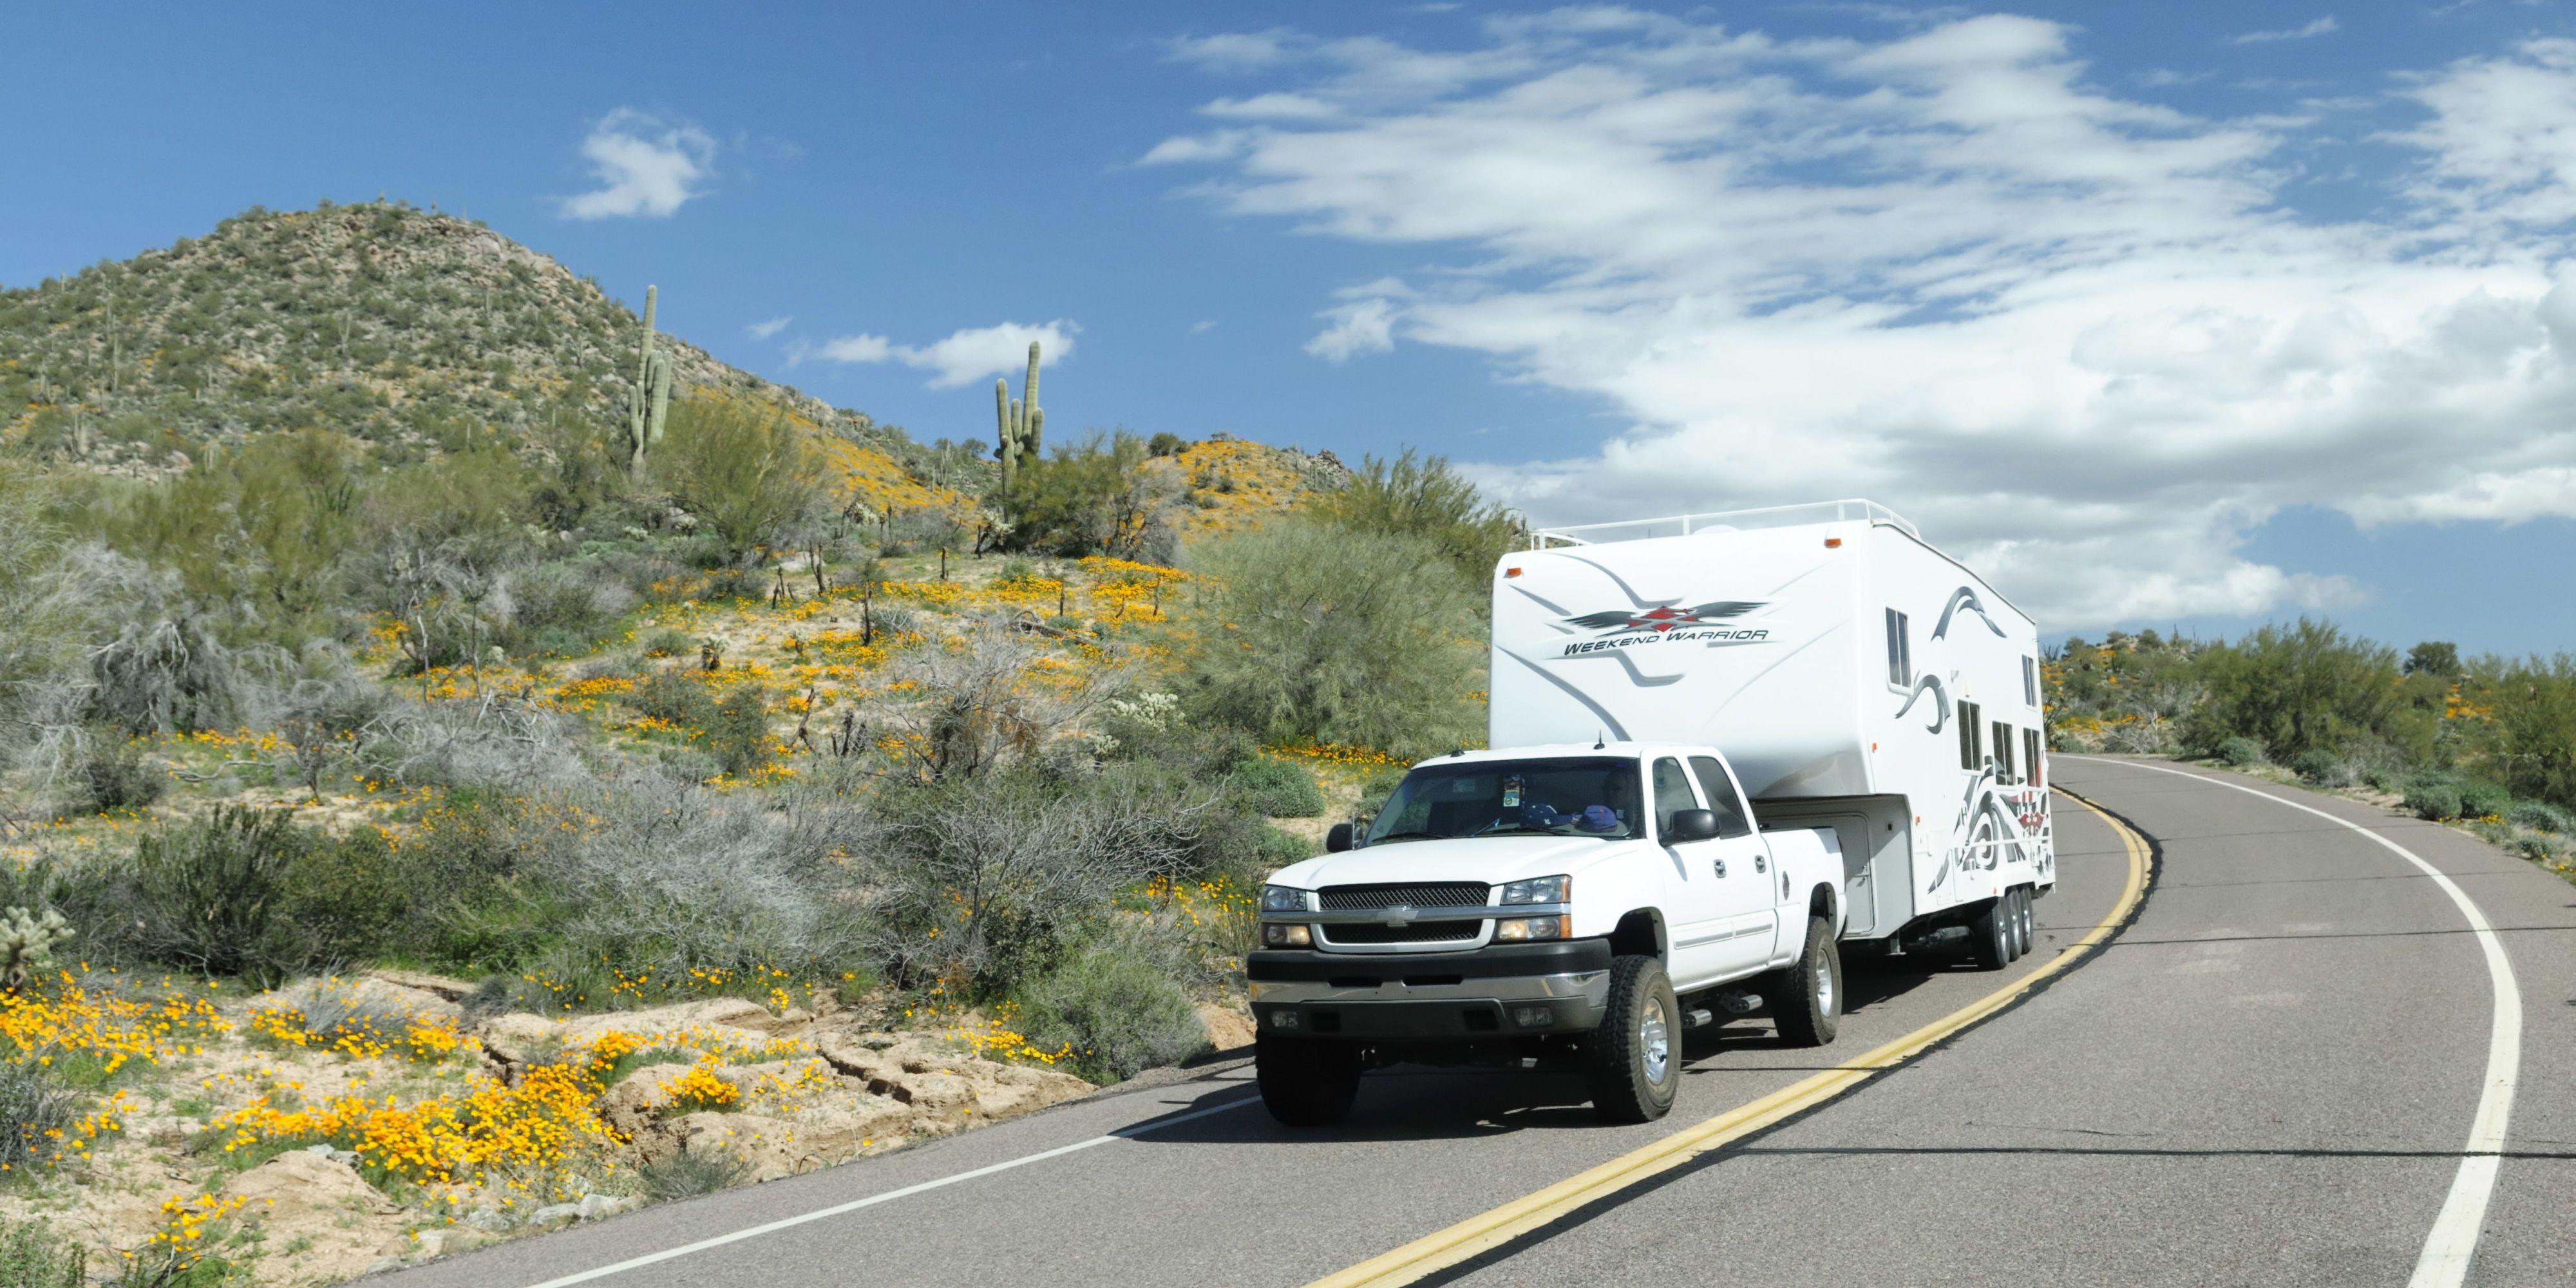 towing a trailer hook up a trailer rh popularmechanics com Semi- Trailer Mechanic Black and White Trailer Mechanic Images